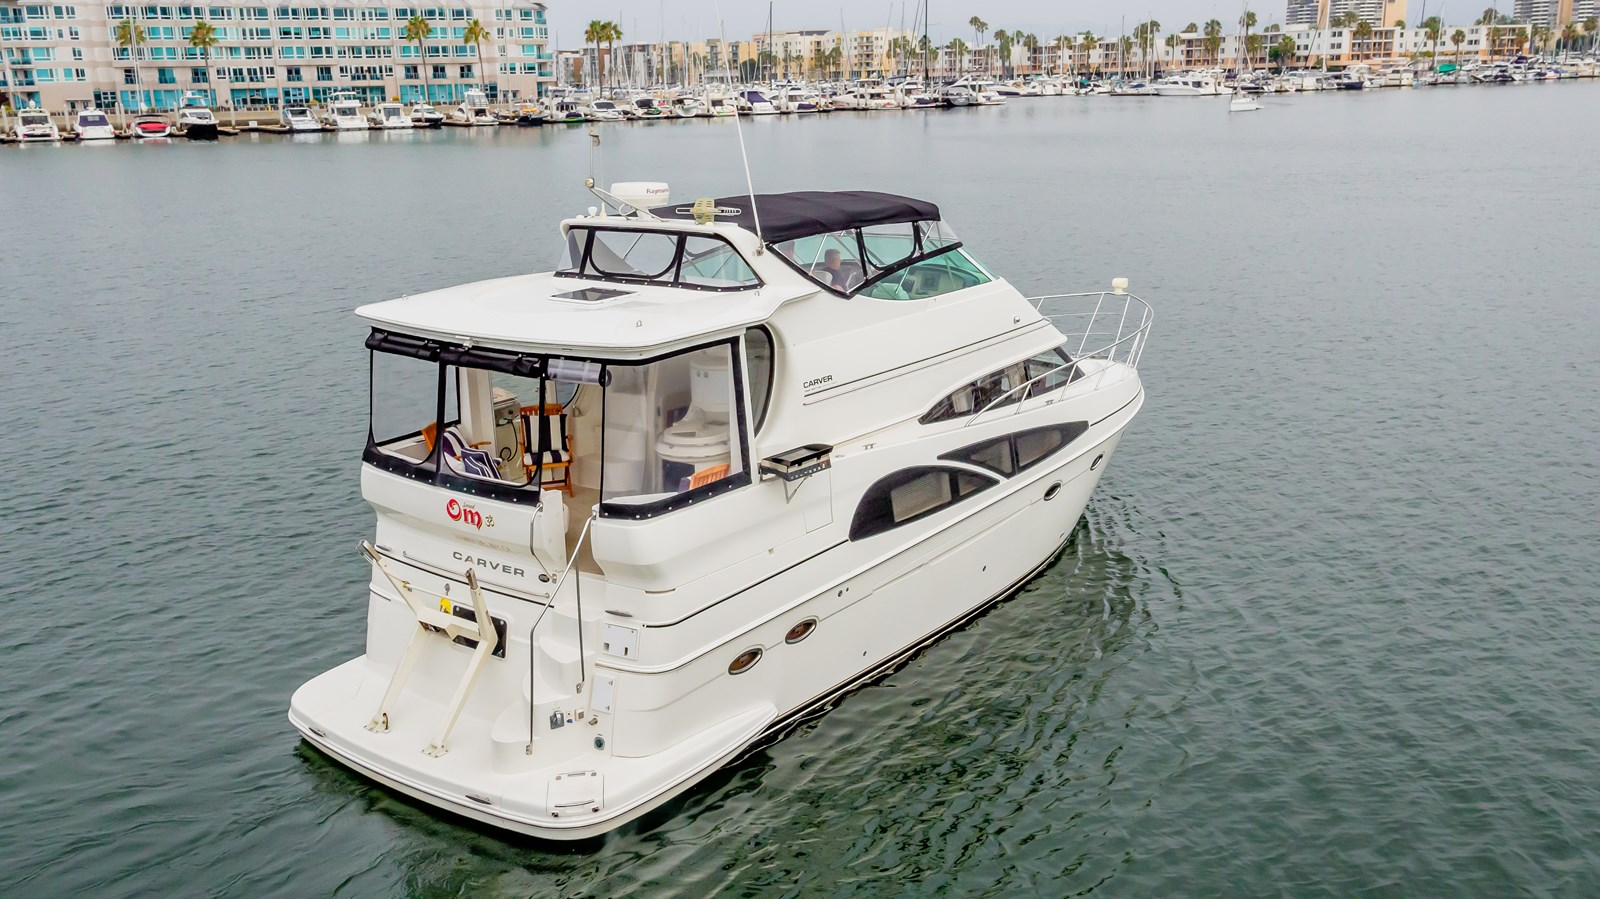 DJI_0043 2005 CARVER  Motor Yacht 2737836